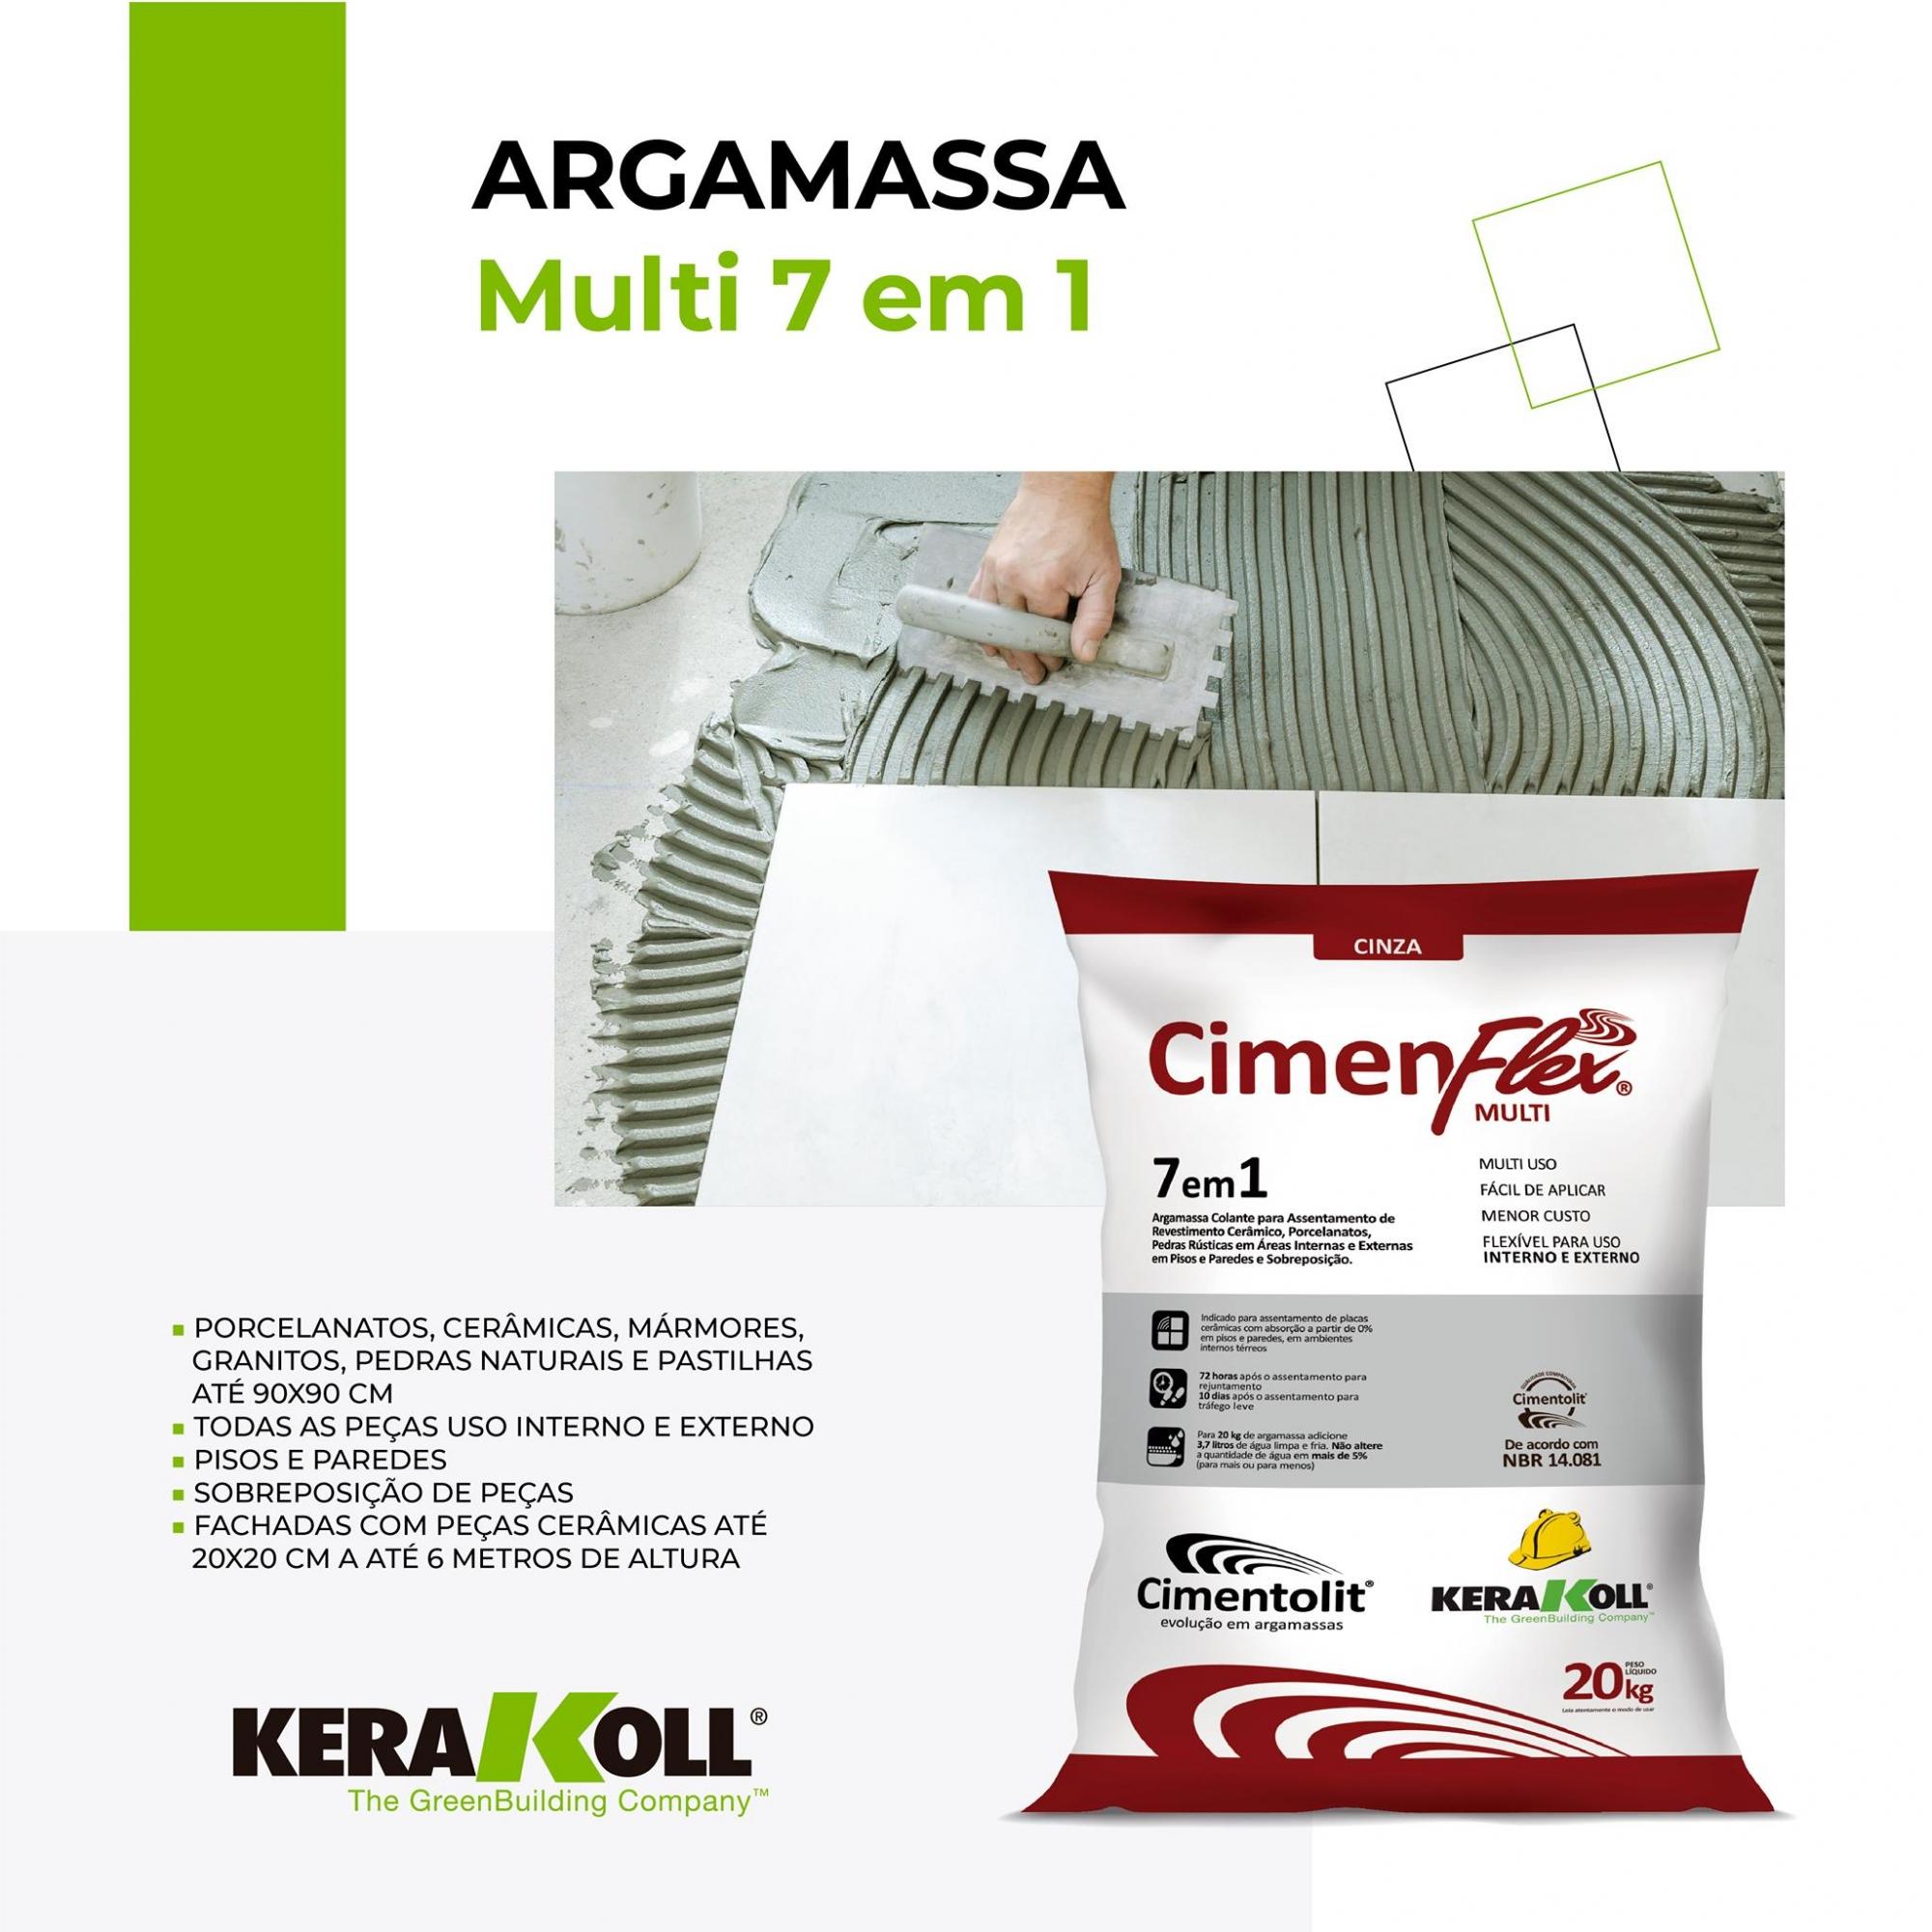 ARGAMASSA CIMENFLEX MULT 7 EM 1 20KG - KERAKOLL